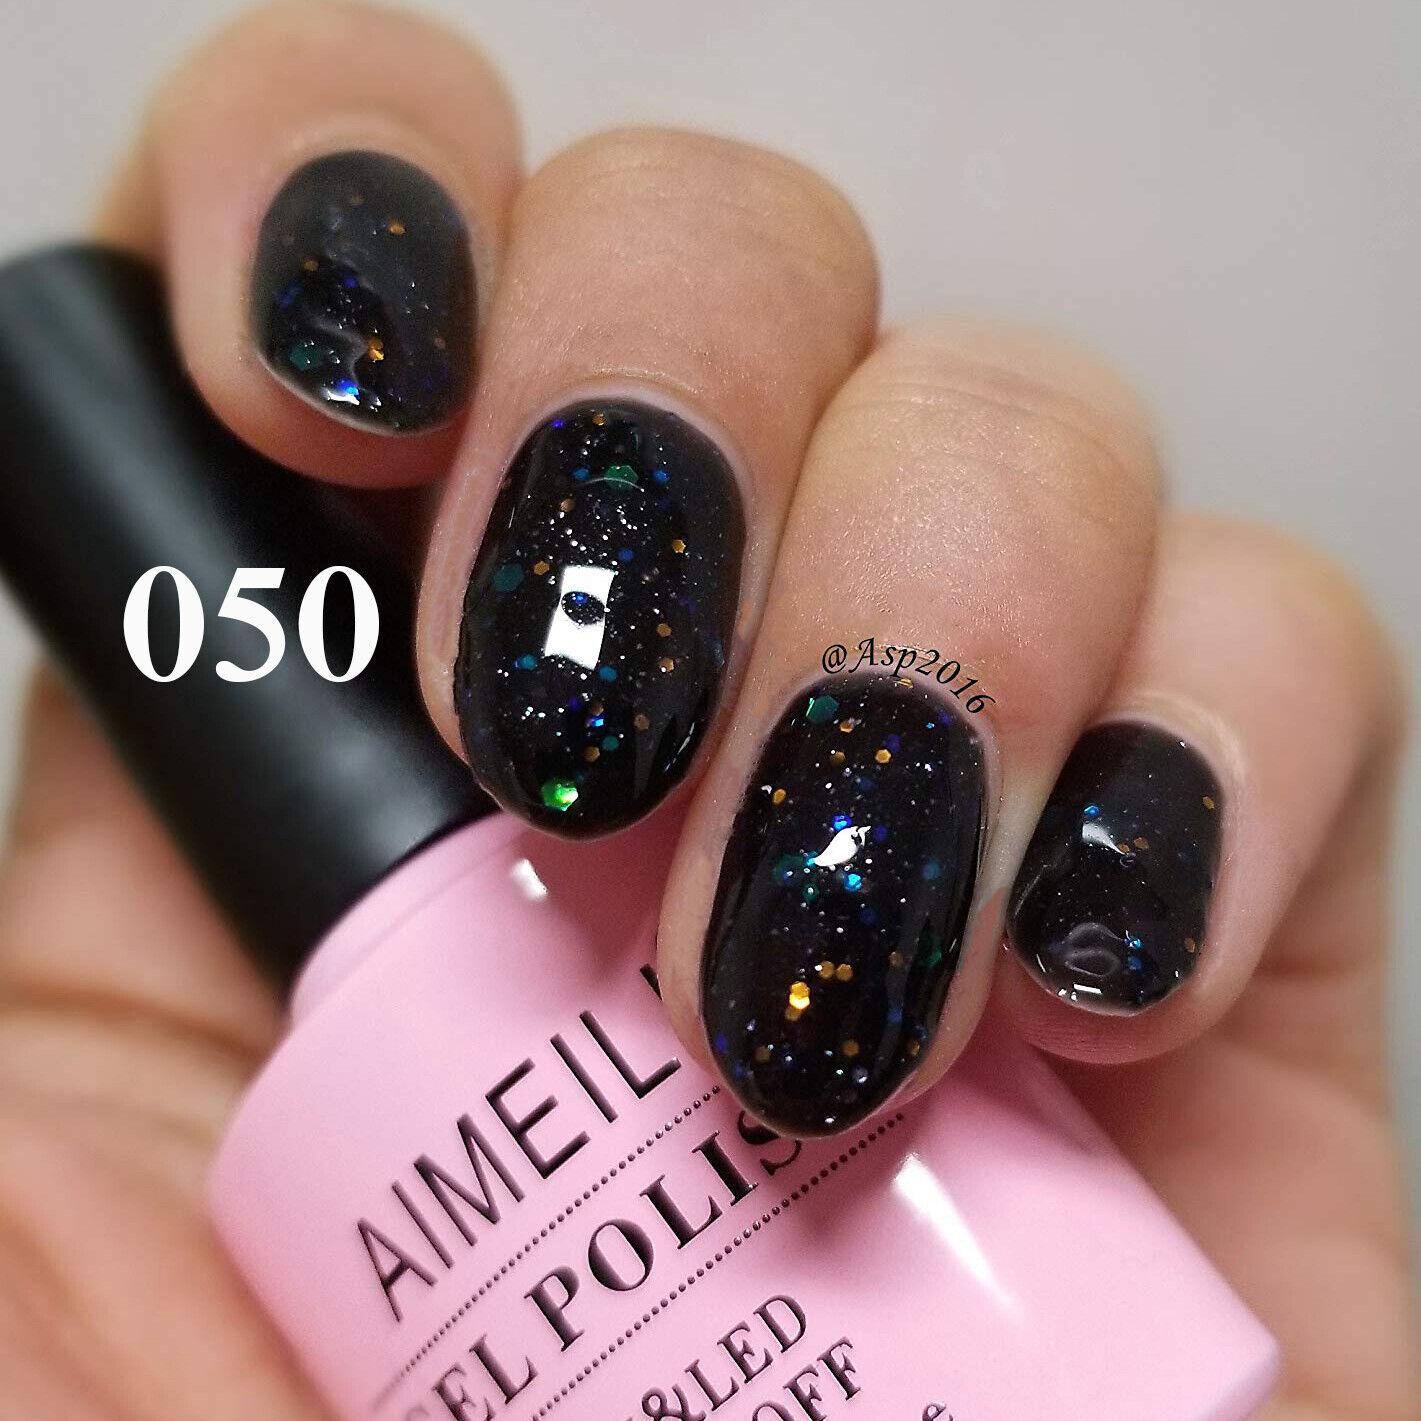 AIMEILI Soak Off UV LED Gel Nail Polish - Black Diamond Glit